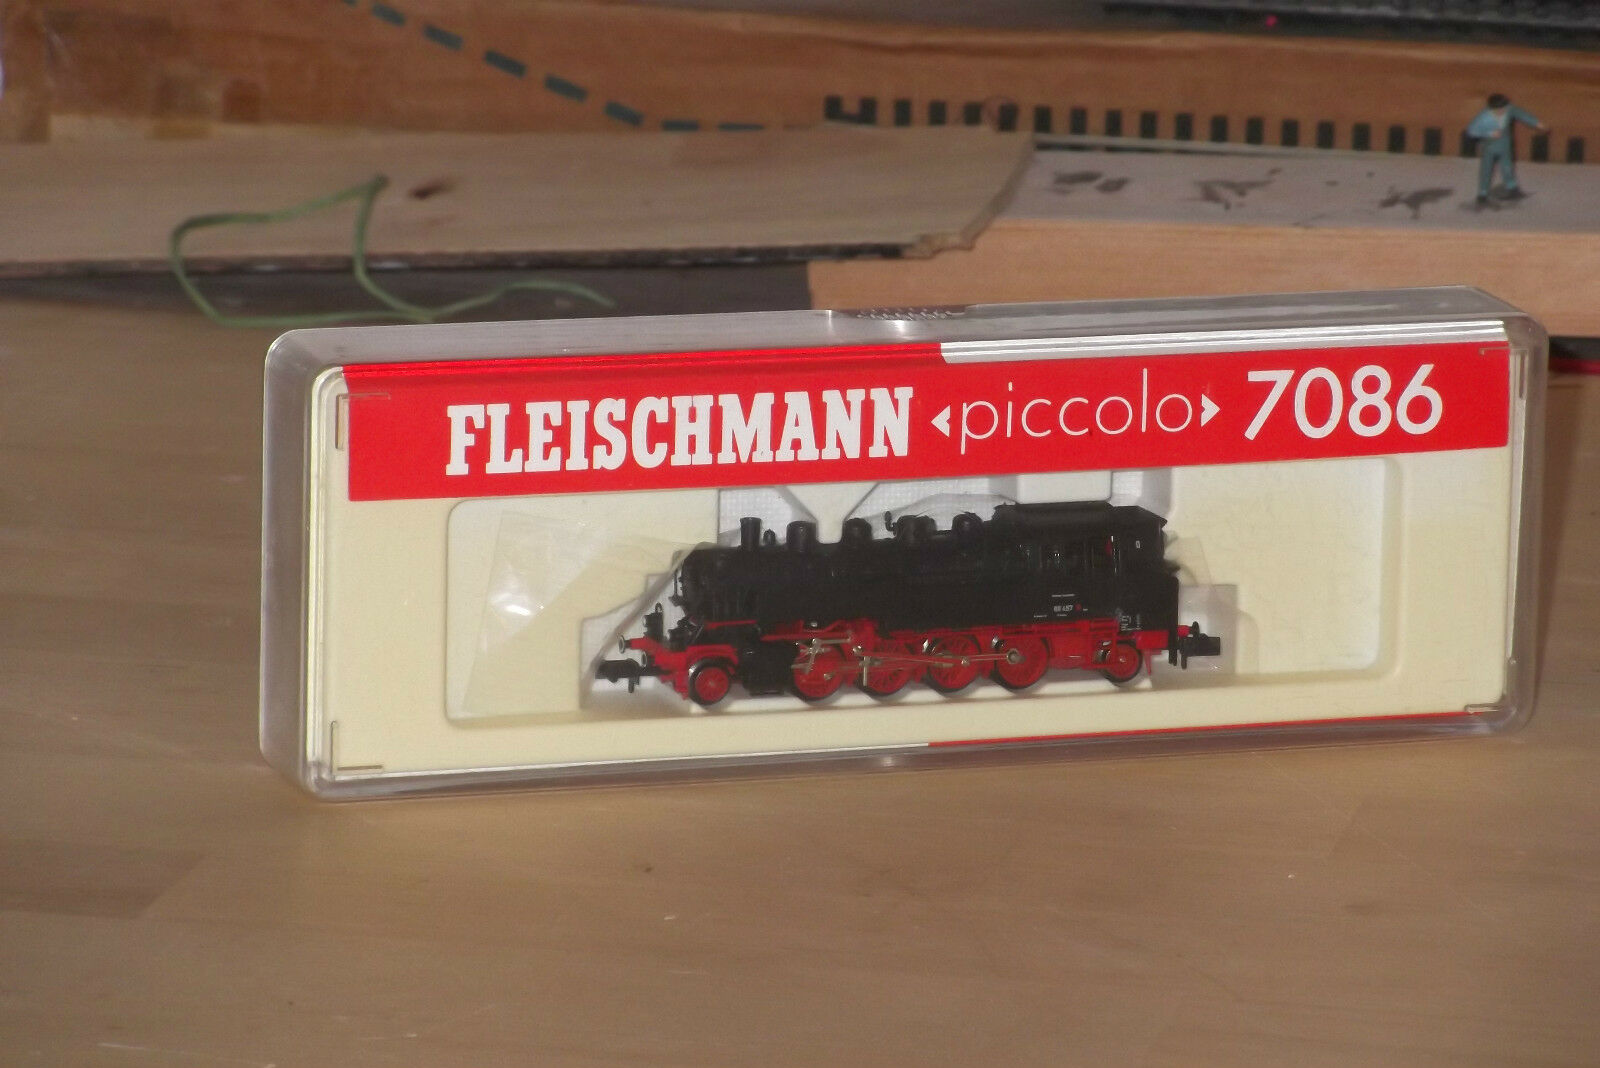 FLEISCHMANN piccolo 7086   2-8-2